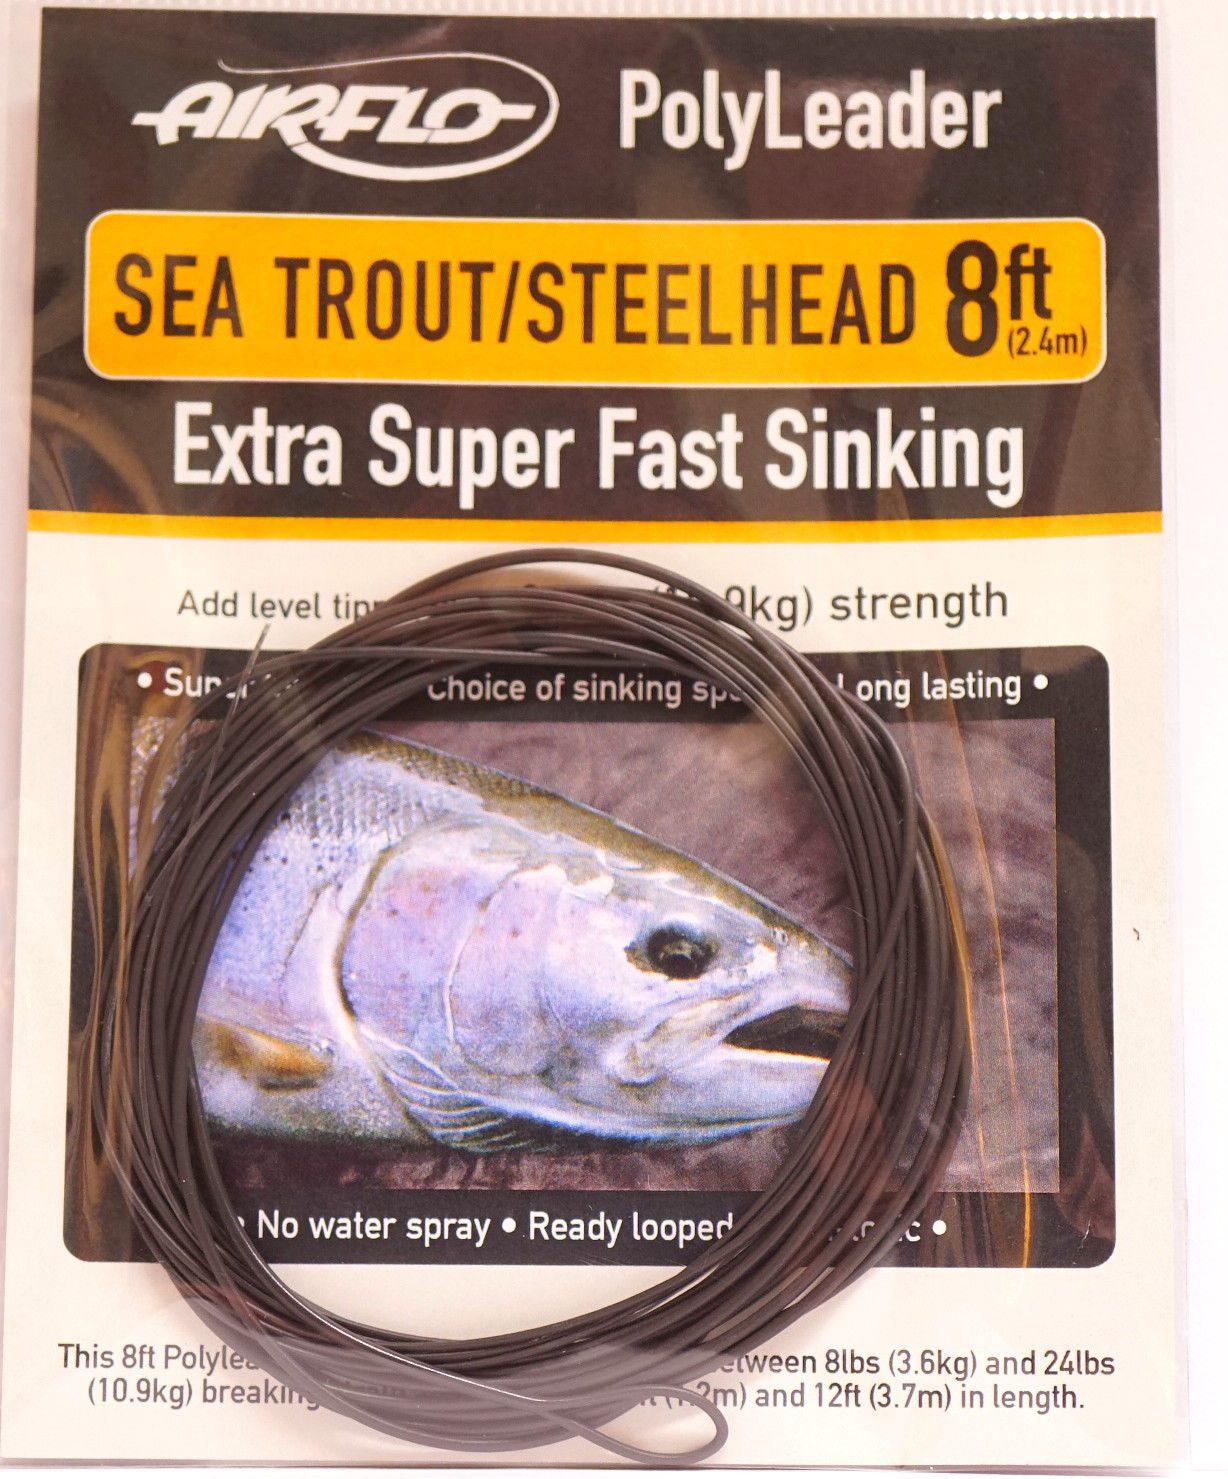 Airflo polyleader Sea Trout Steelhead Ex.Super Fast Sinking 8 ft